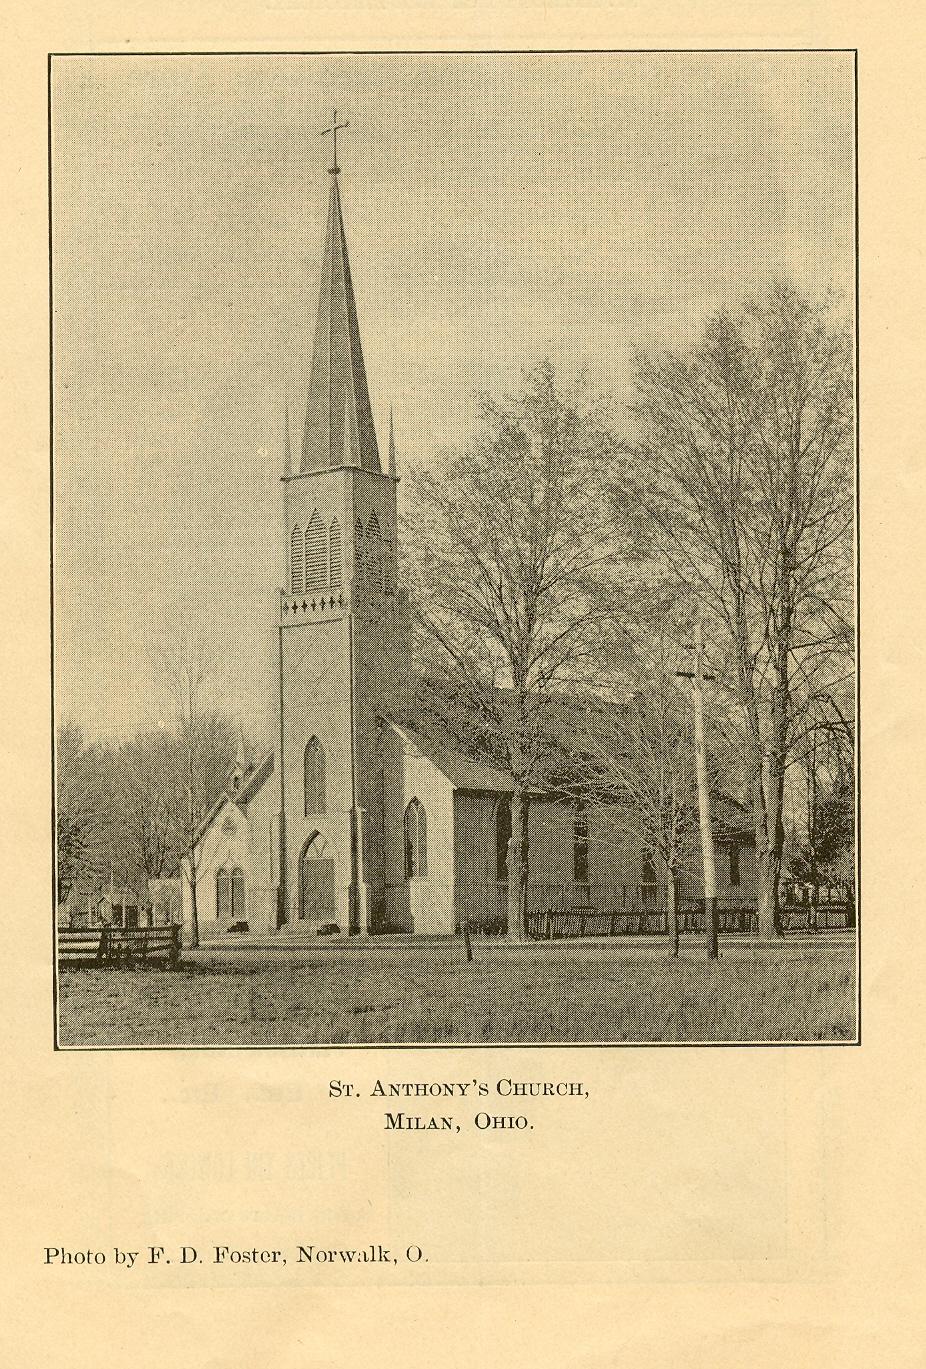 [1900]